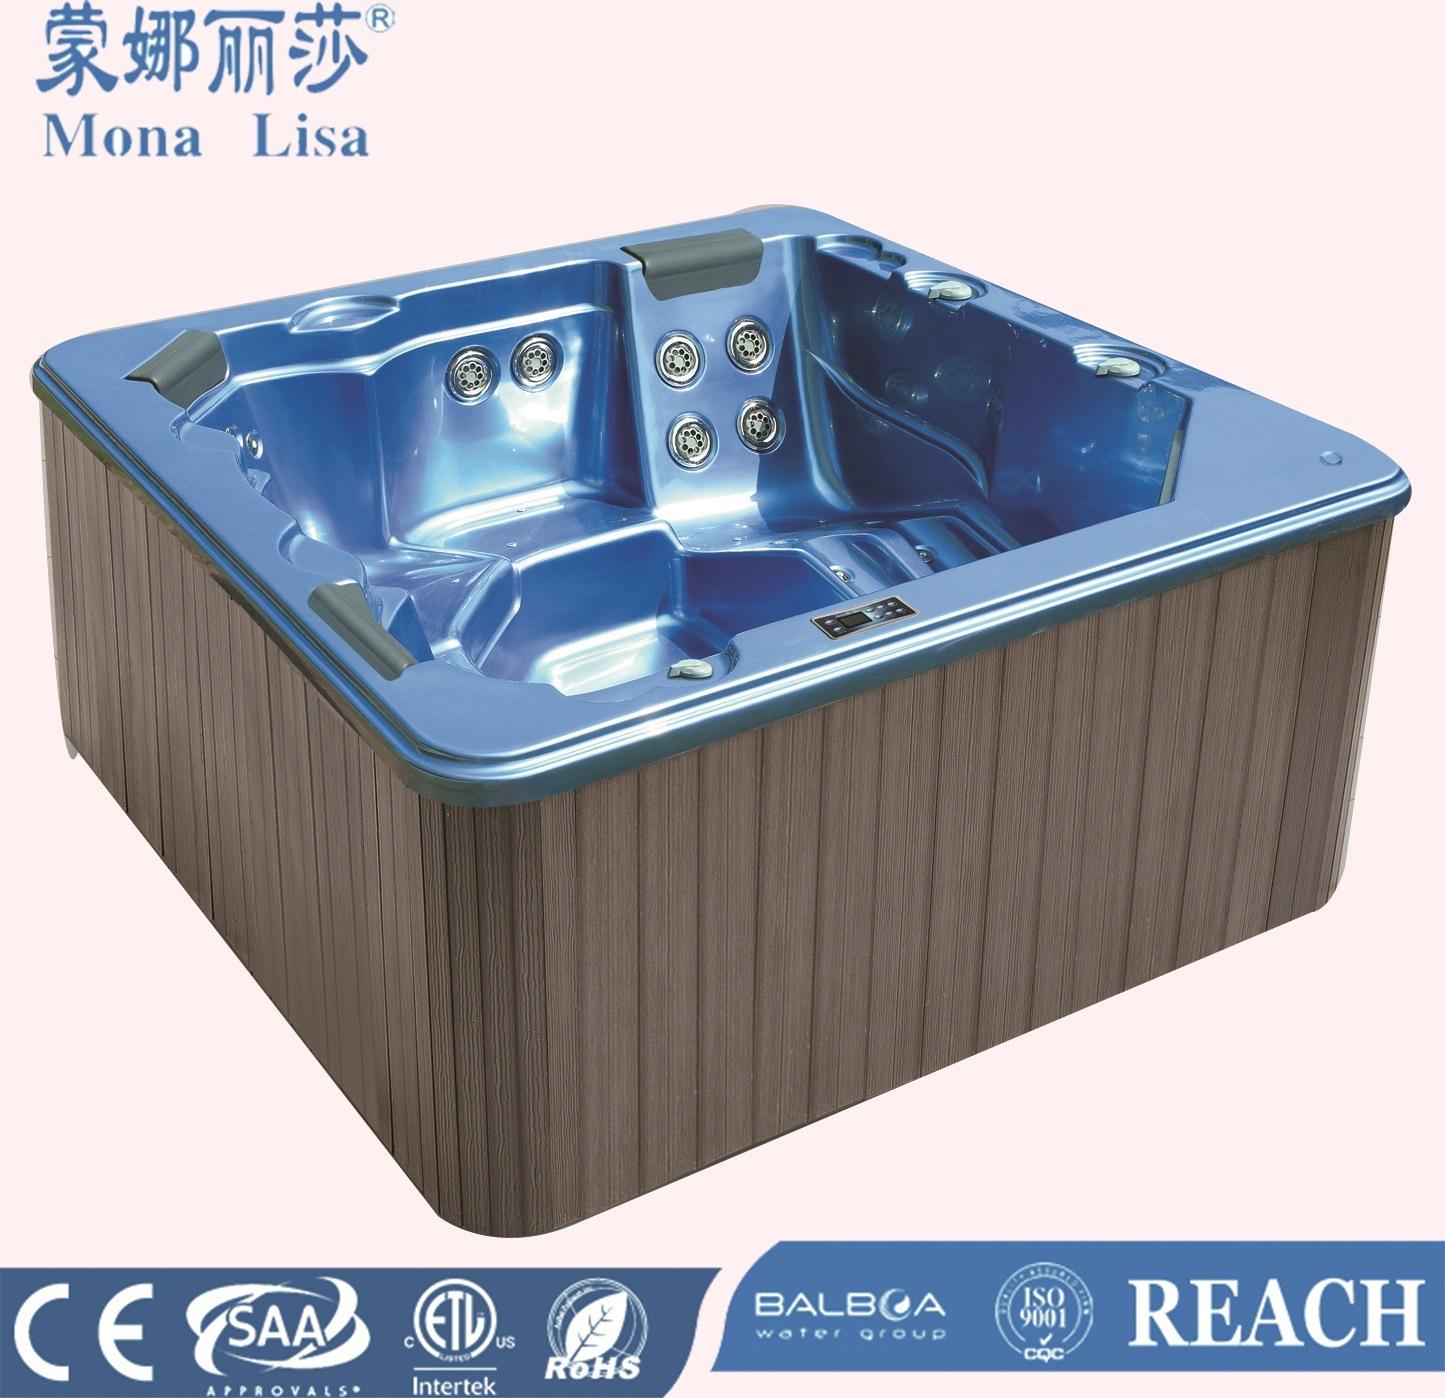 China Monalisa USA Lucite Acrylic Balboa Control SPA Hot Tub (M-3327 ...